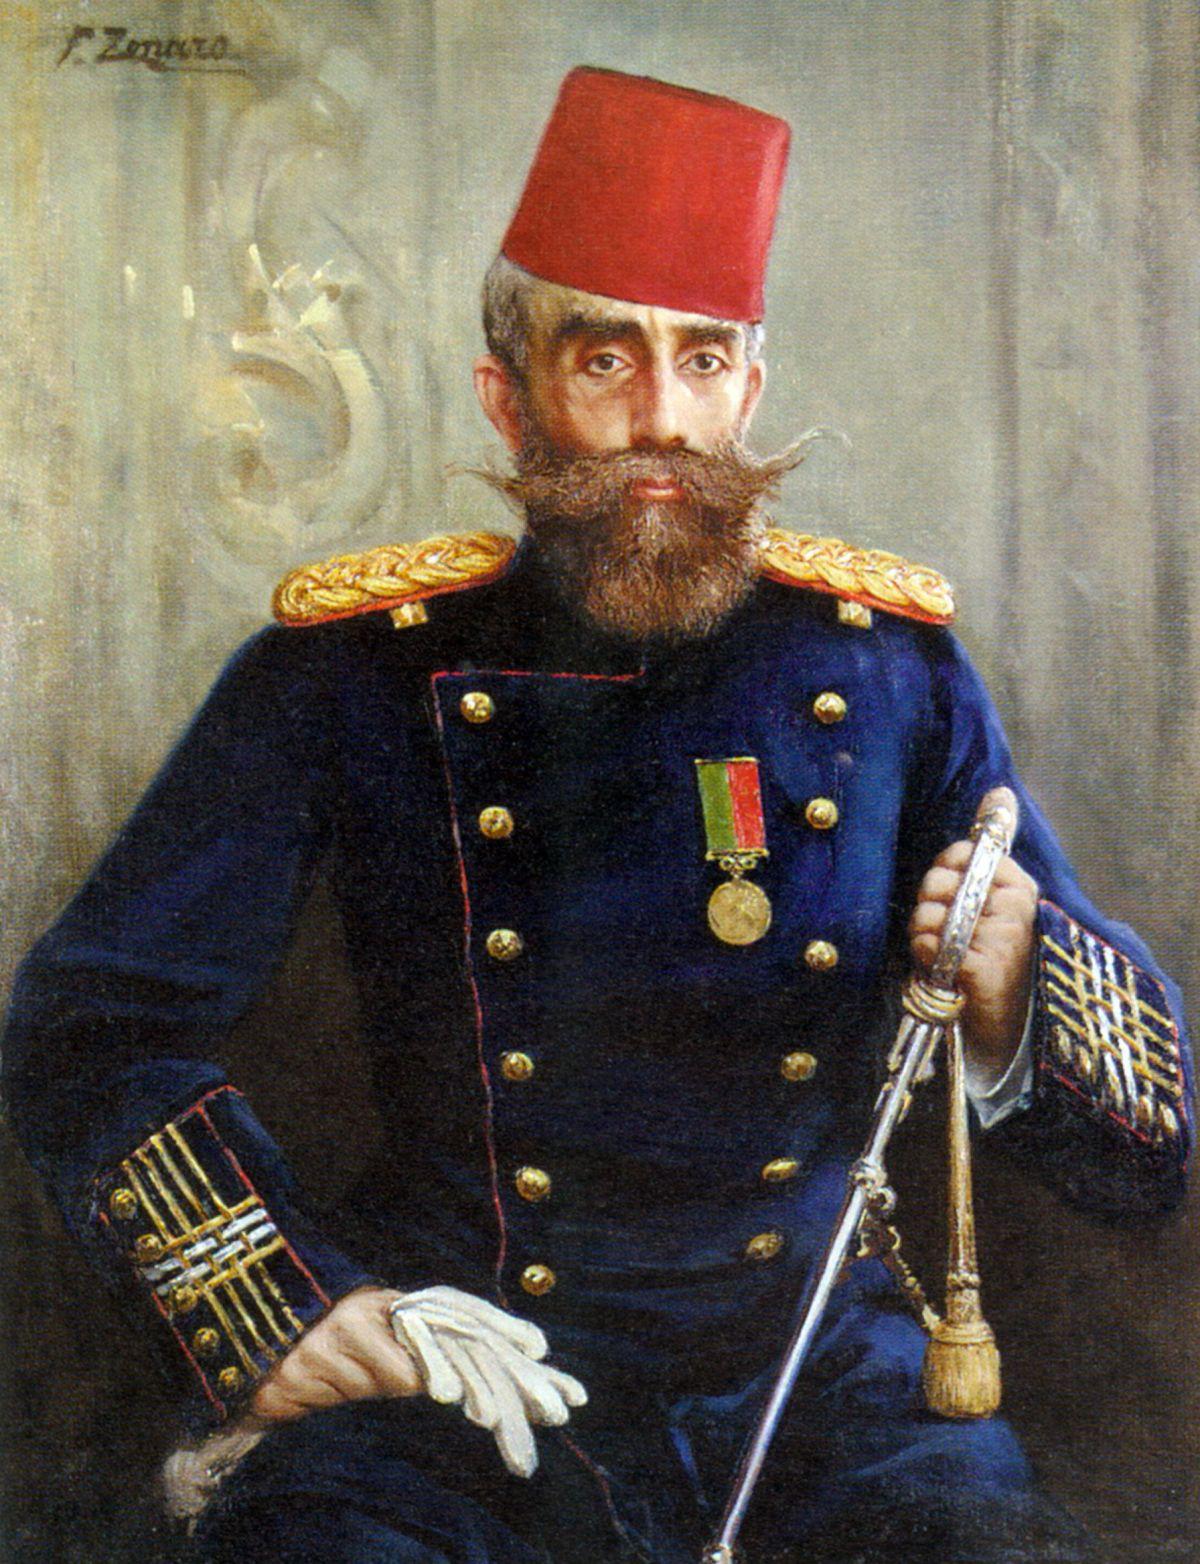 Portrait of Mahmud Sevket Pasha by Fausto Zonaro